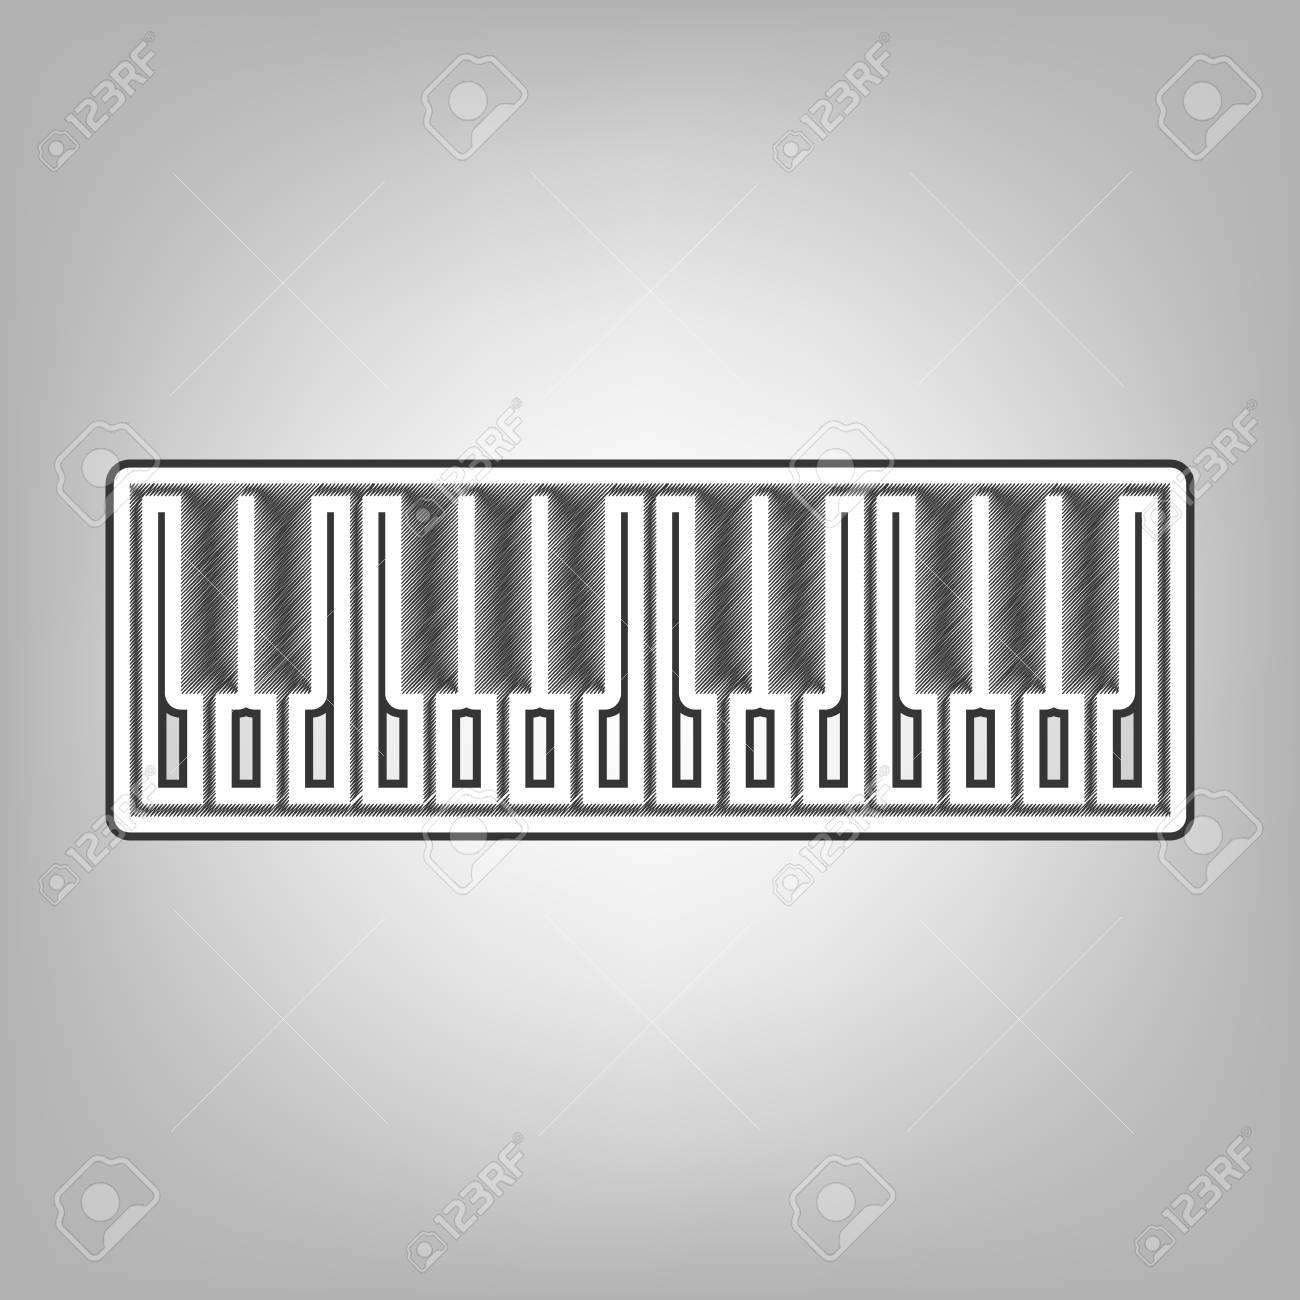 Piano Keyboard sign  Vector  Pencil sketch imitation  Dark gray